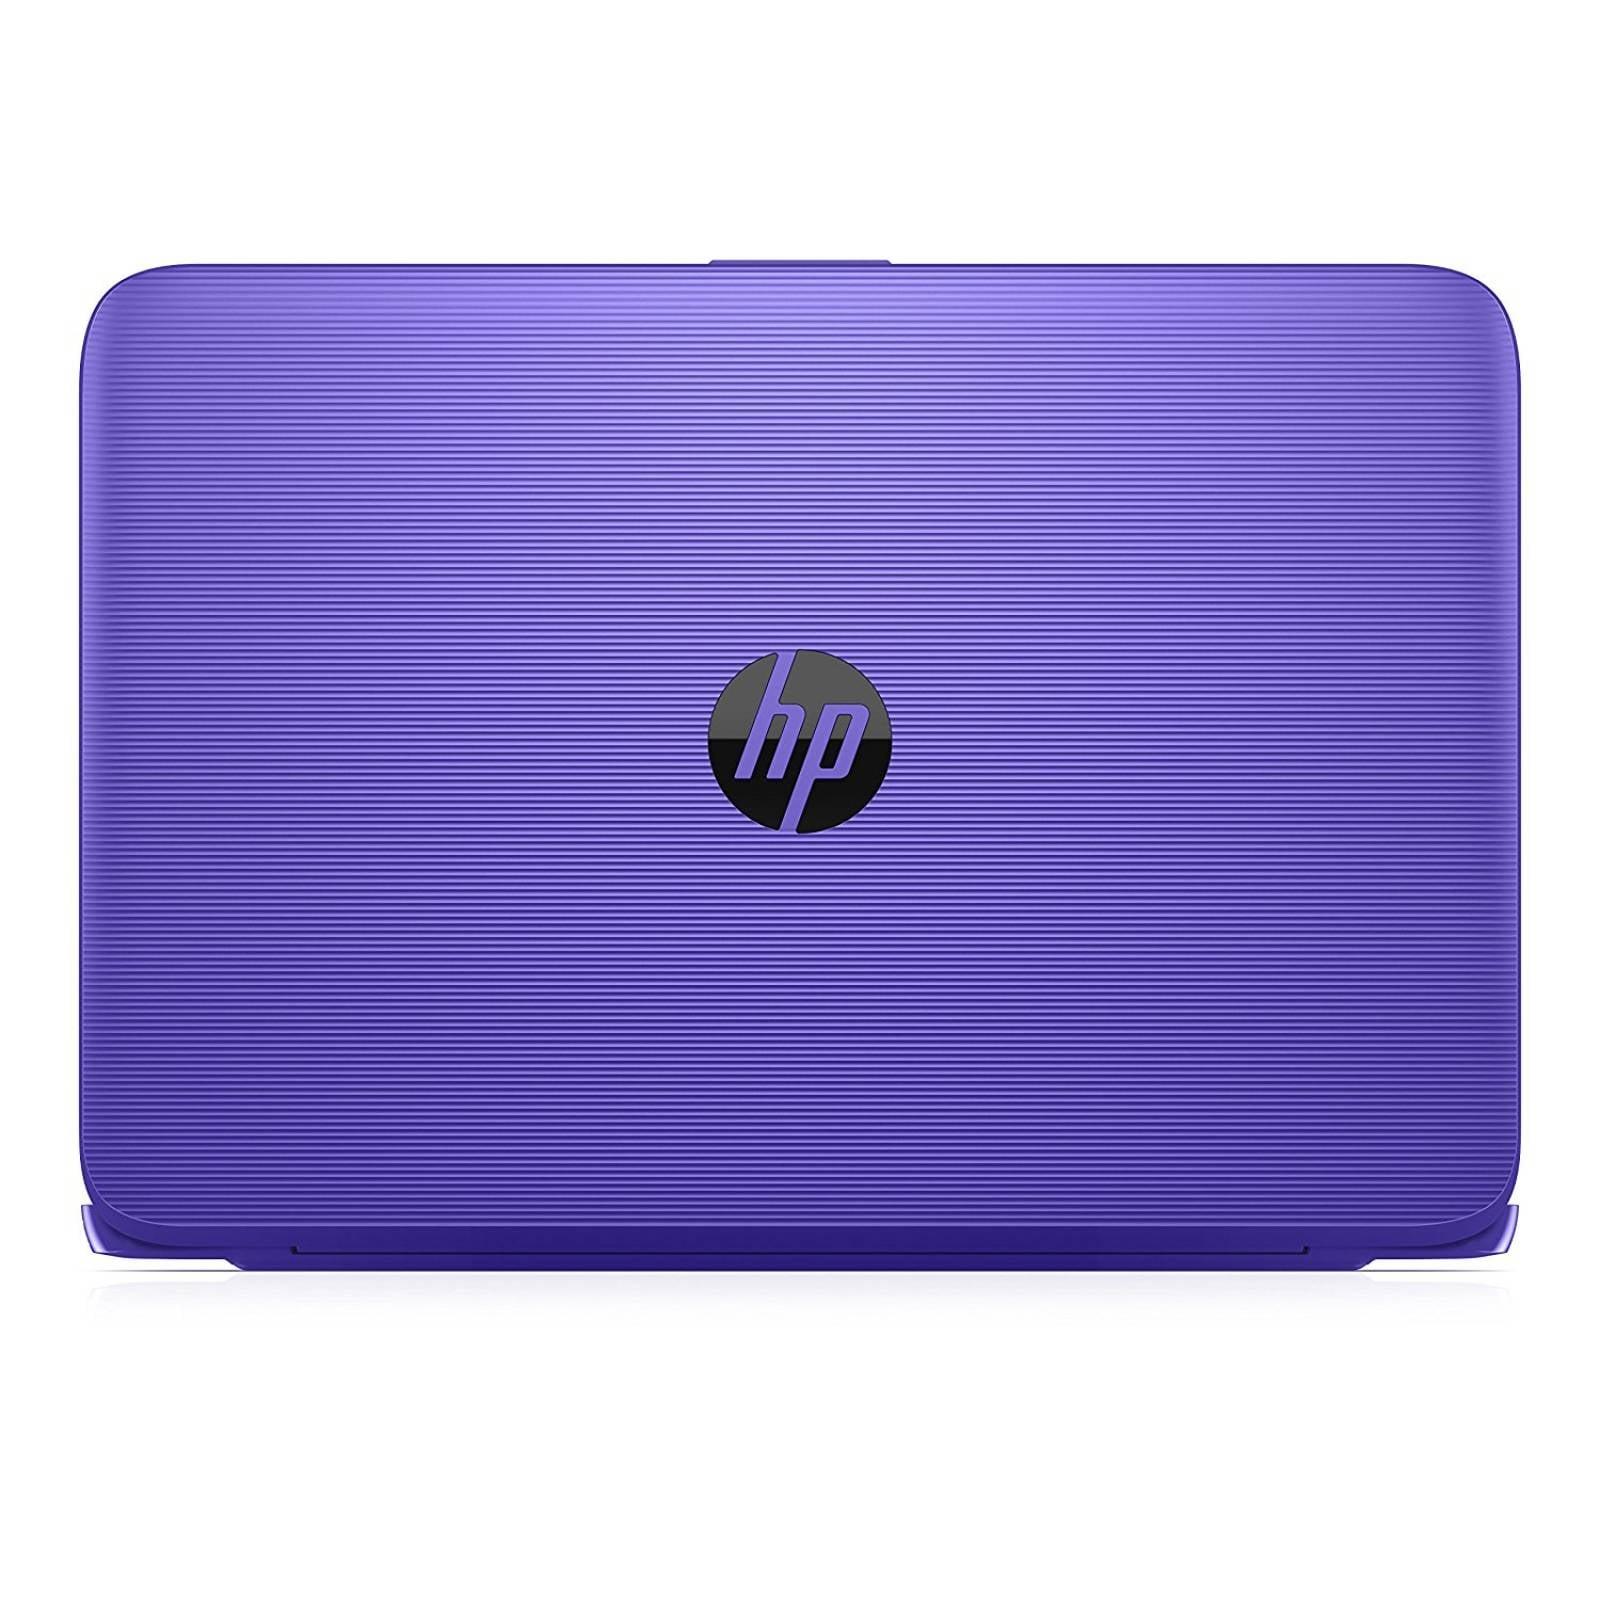 Laptop Hp Stream Laptop 11y020nr 4gb Ram 32gb Emmc -morado